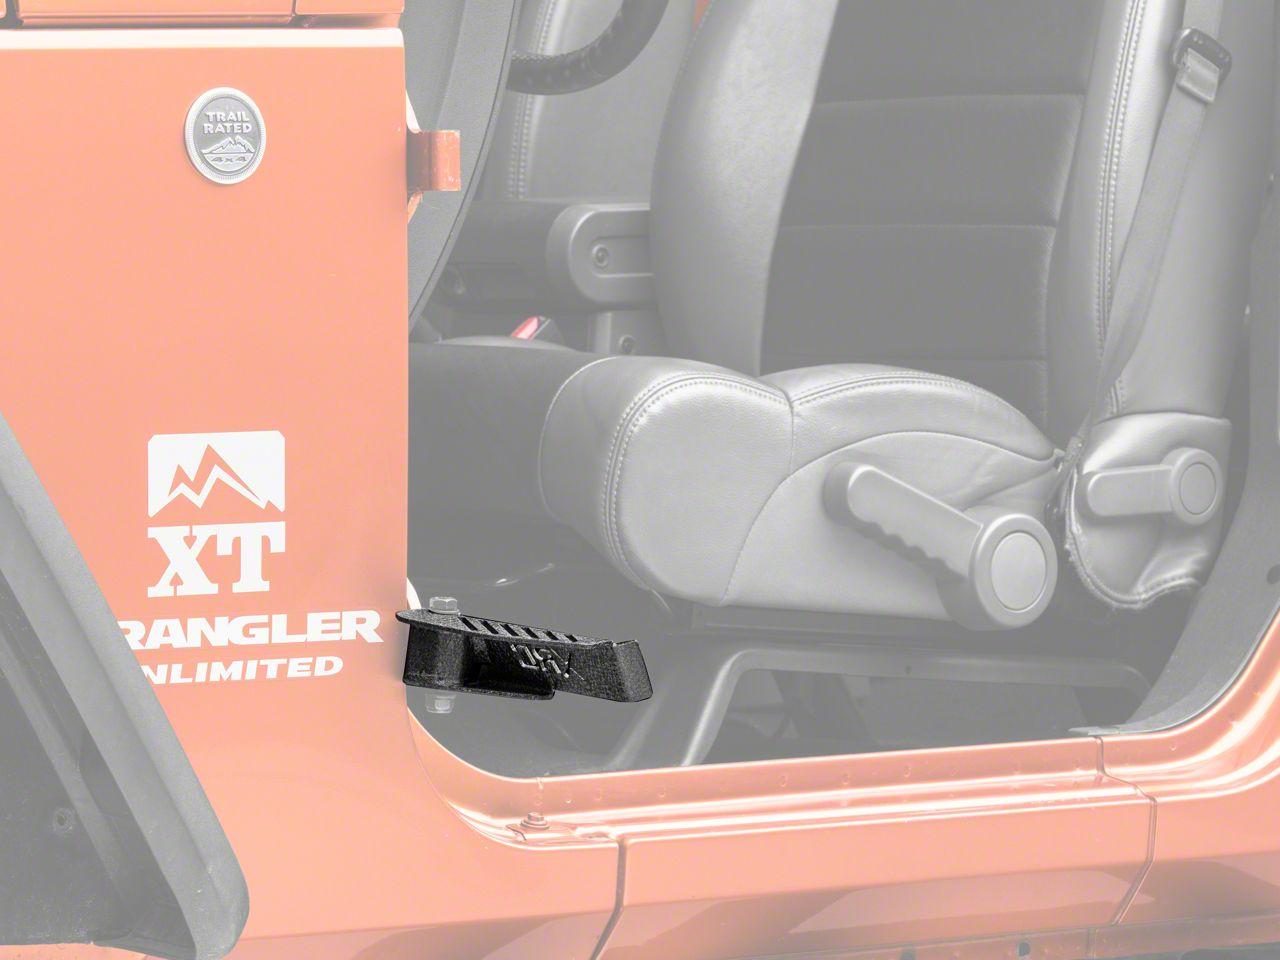 184 Front Foot Pegs Lantsun Black Steel Peg for 2007-2017 Jeep Wrangler JK 2DR JKU 4DR JL-1 Pair